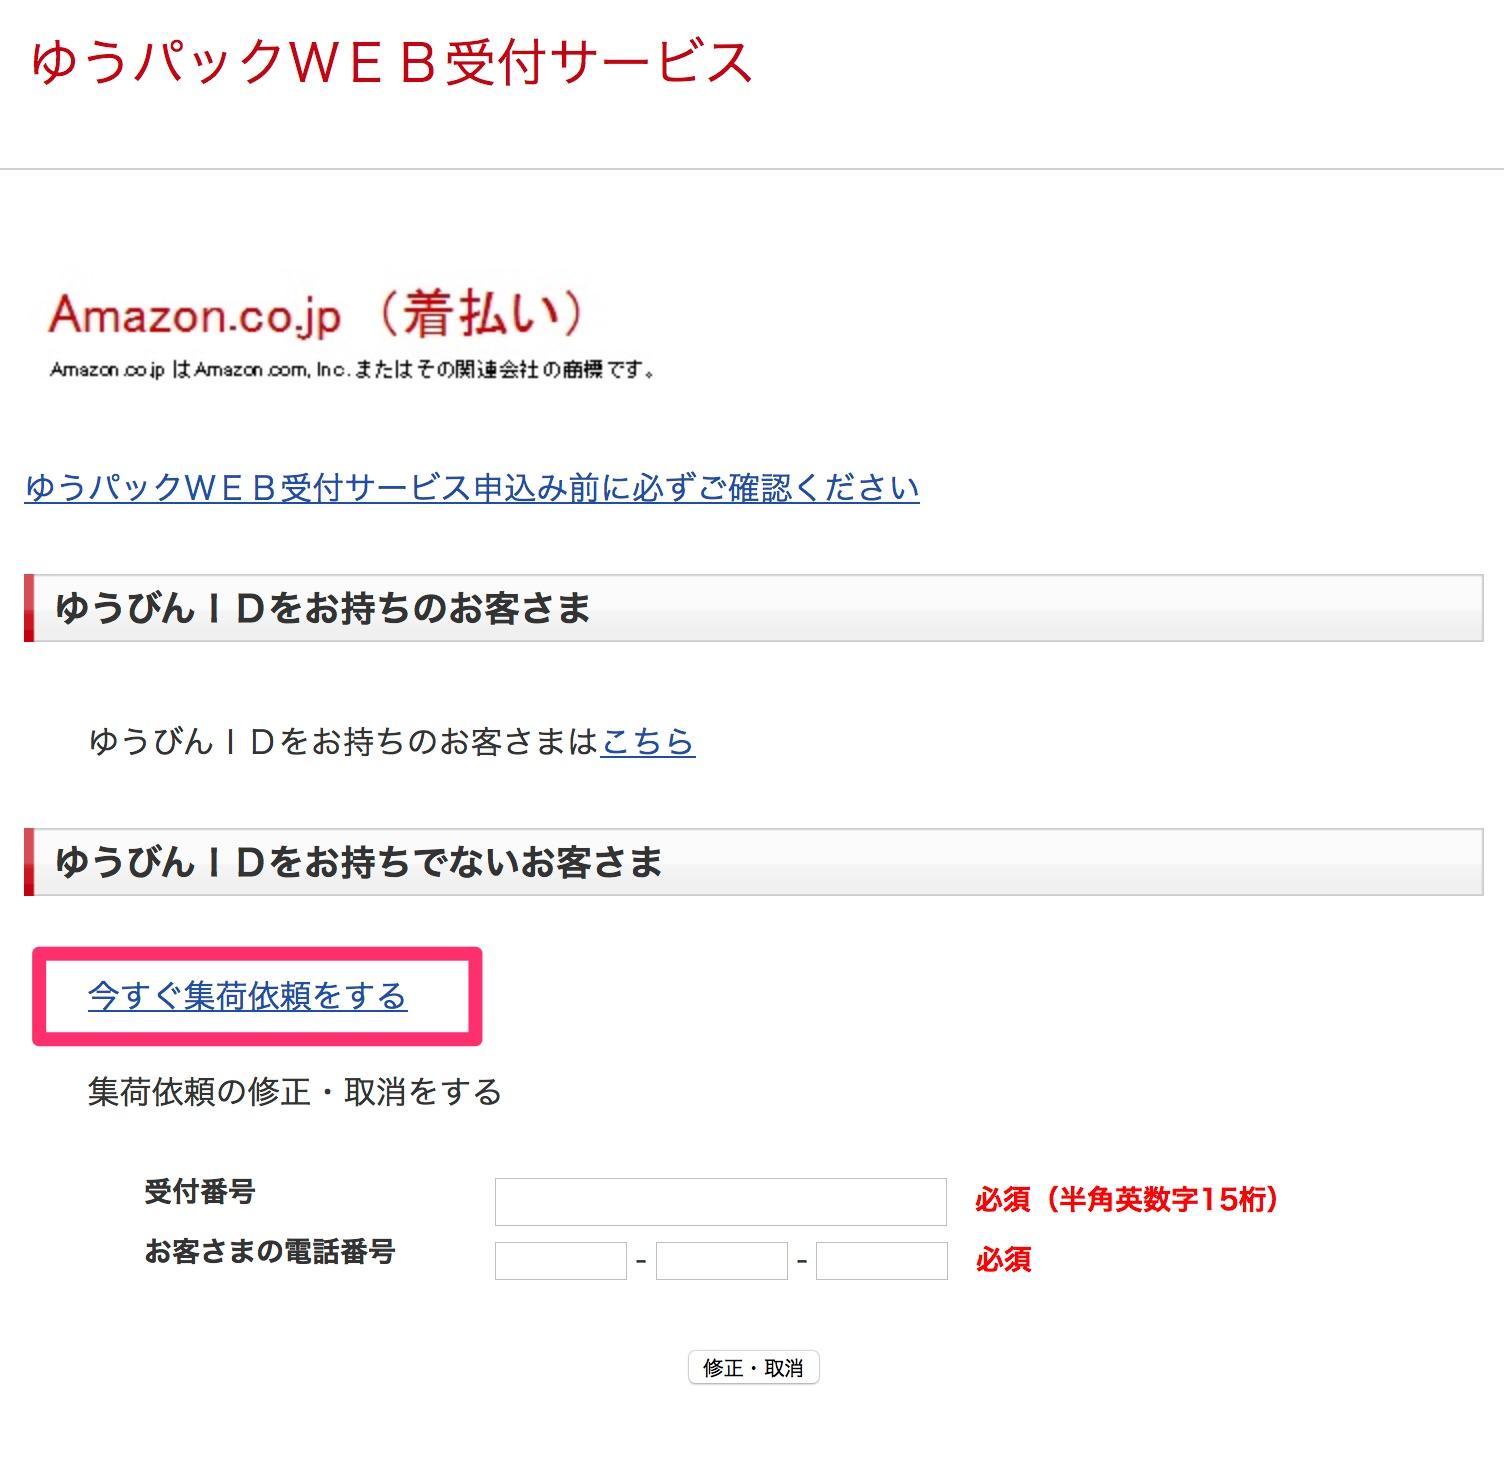 62ecd45075aeb201bb415f73aa96813e - 試着しても0円で返品できる、Amazon Fashionを利用しよう